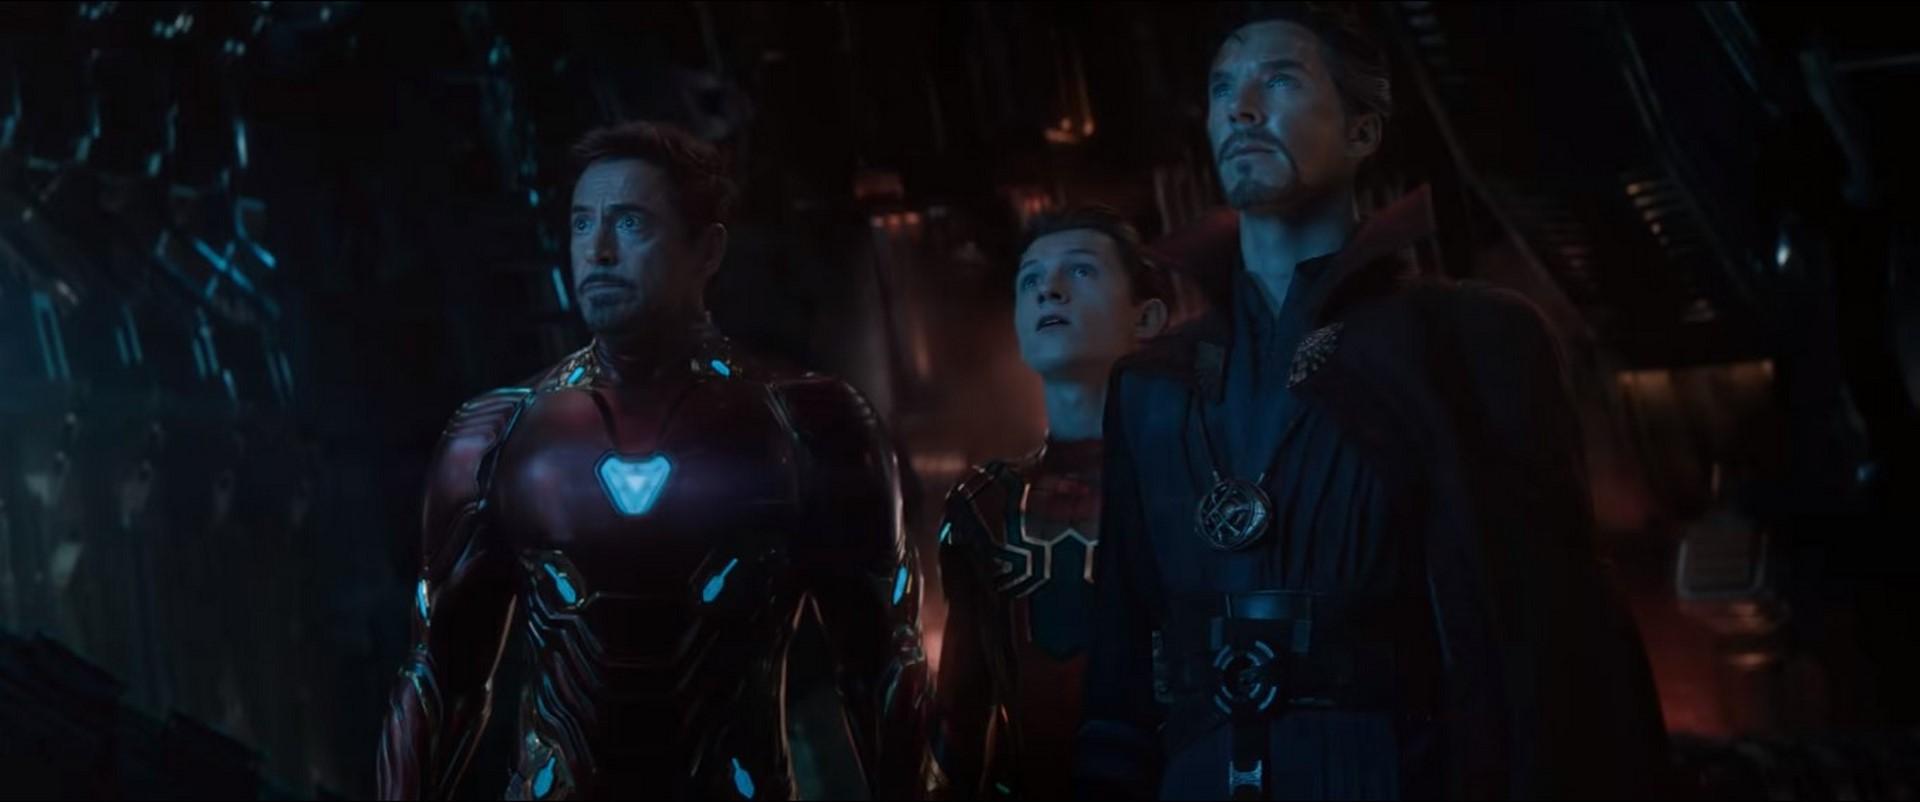 Arc Reactor II Tank Top Iron Avengers Tony Stark Mark si INVINCIBLE Industries